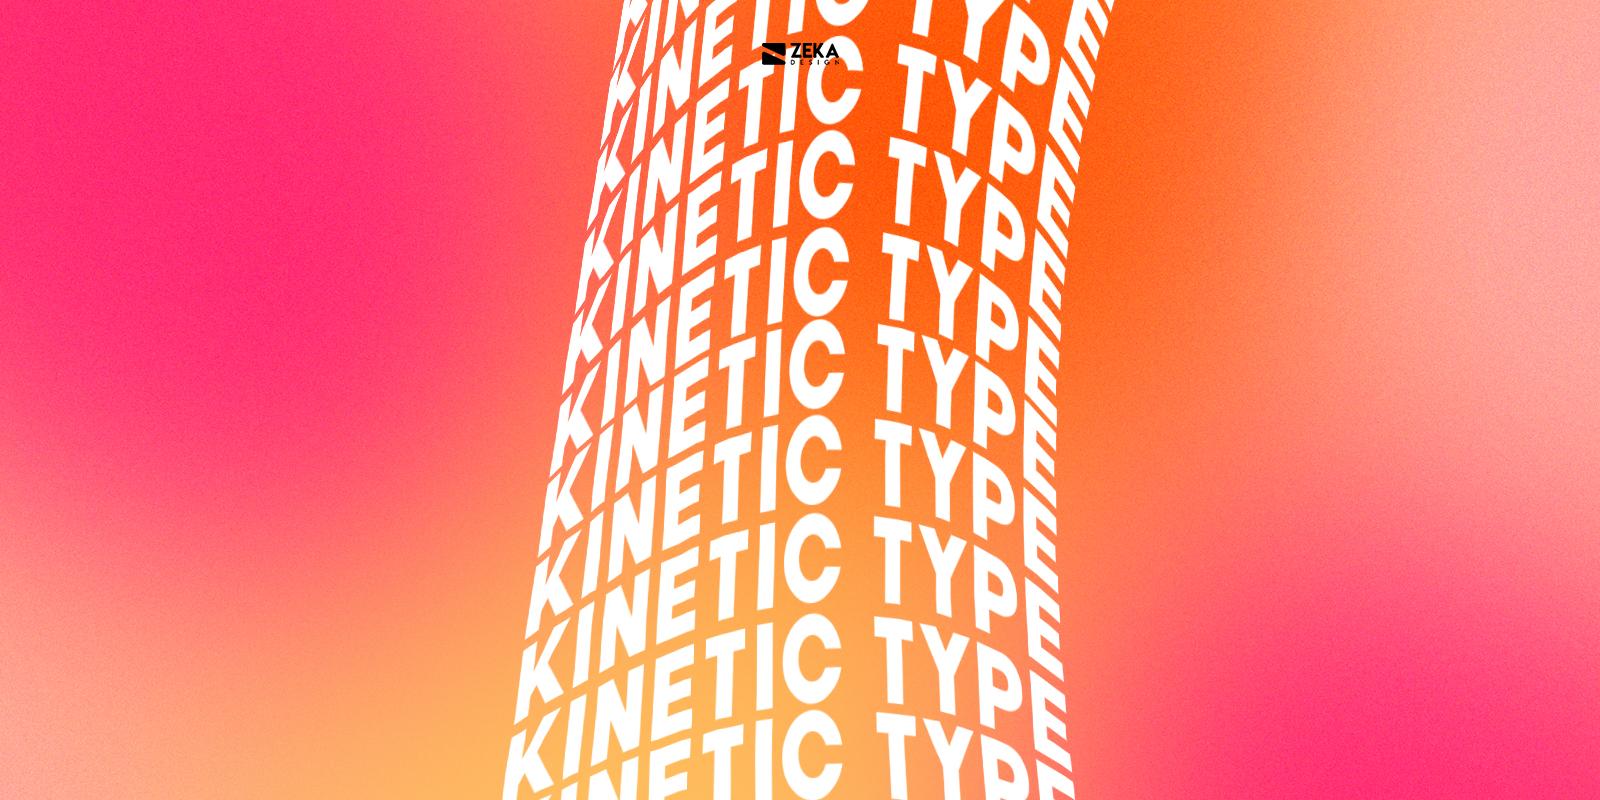 Kinetic Type Typography Design Trends 2021